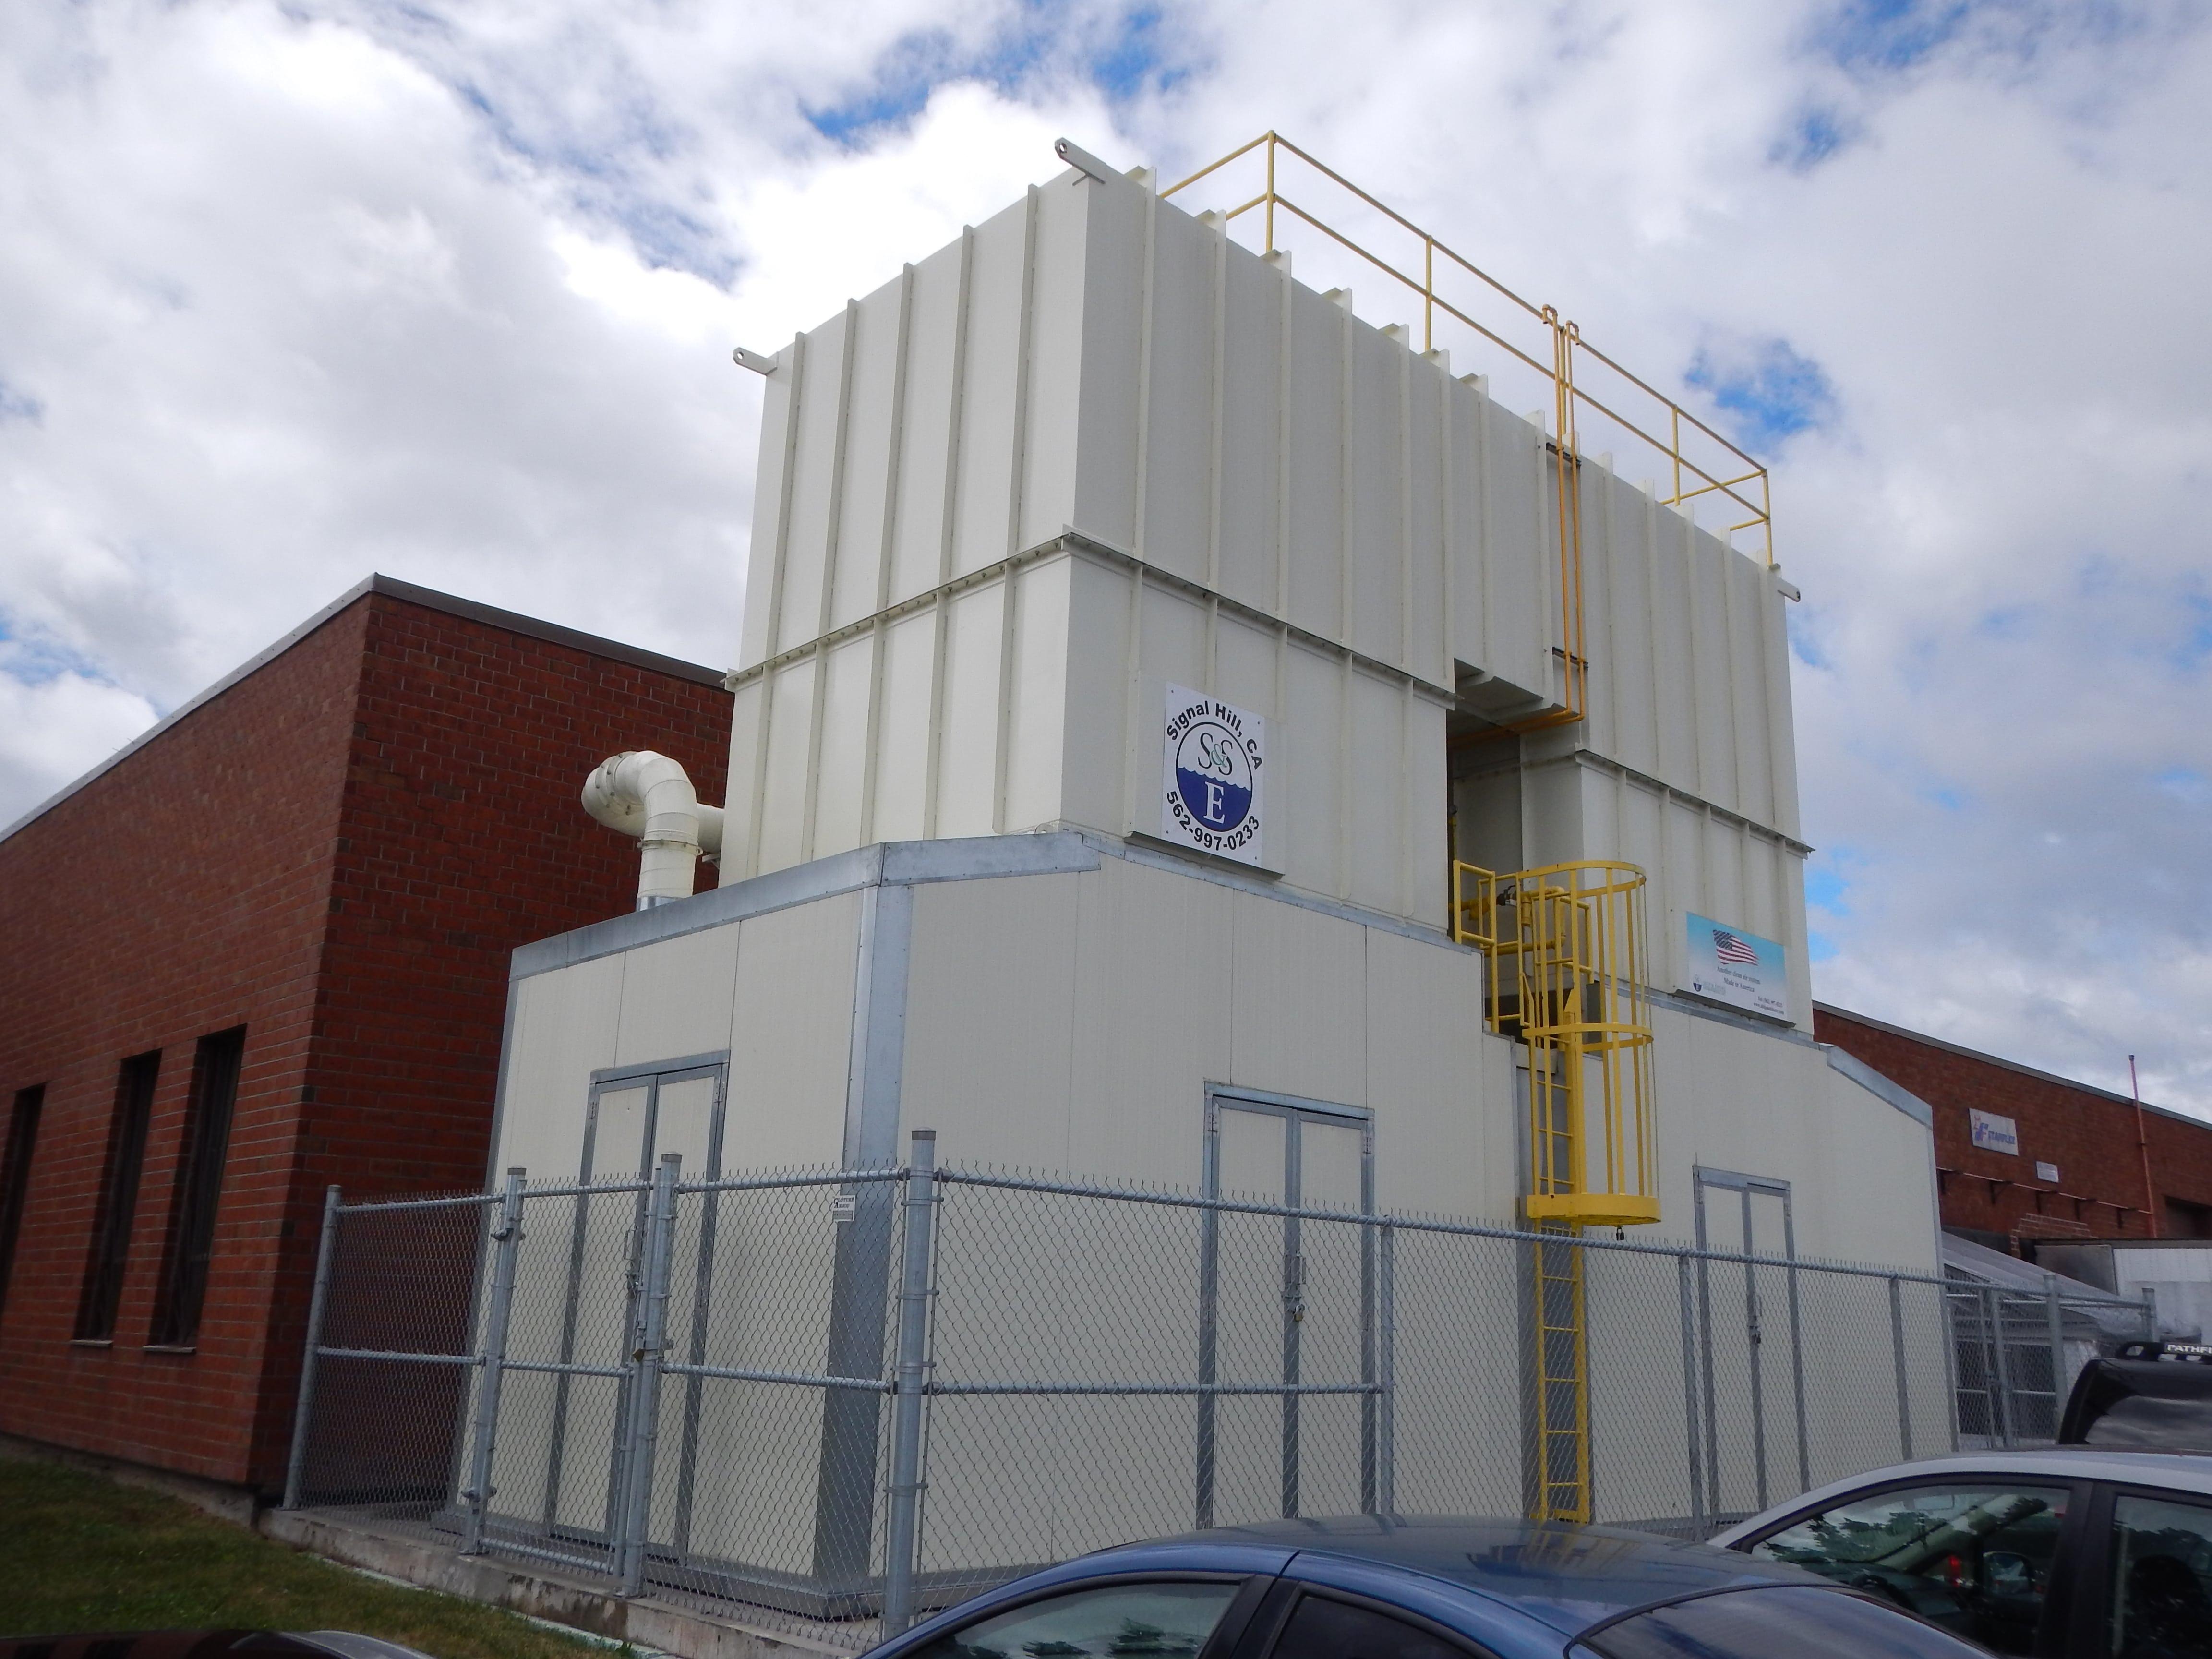 33,000 SCFM Regenerative Thermal Oxidizer